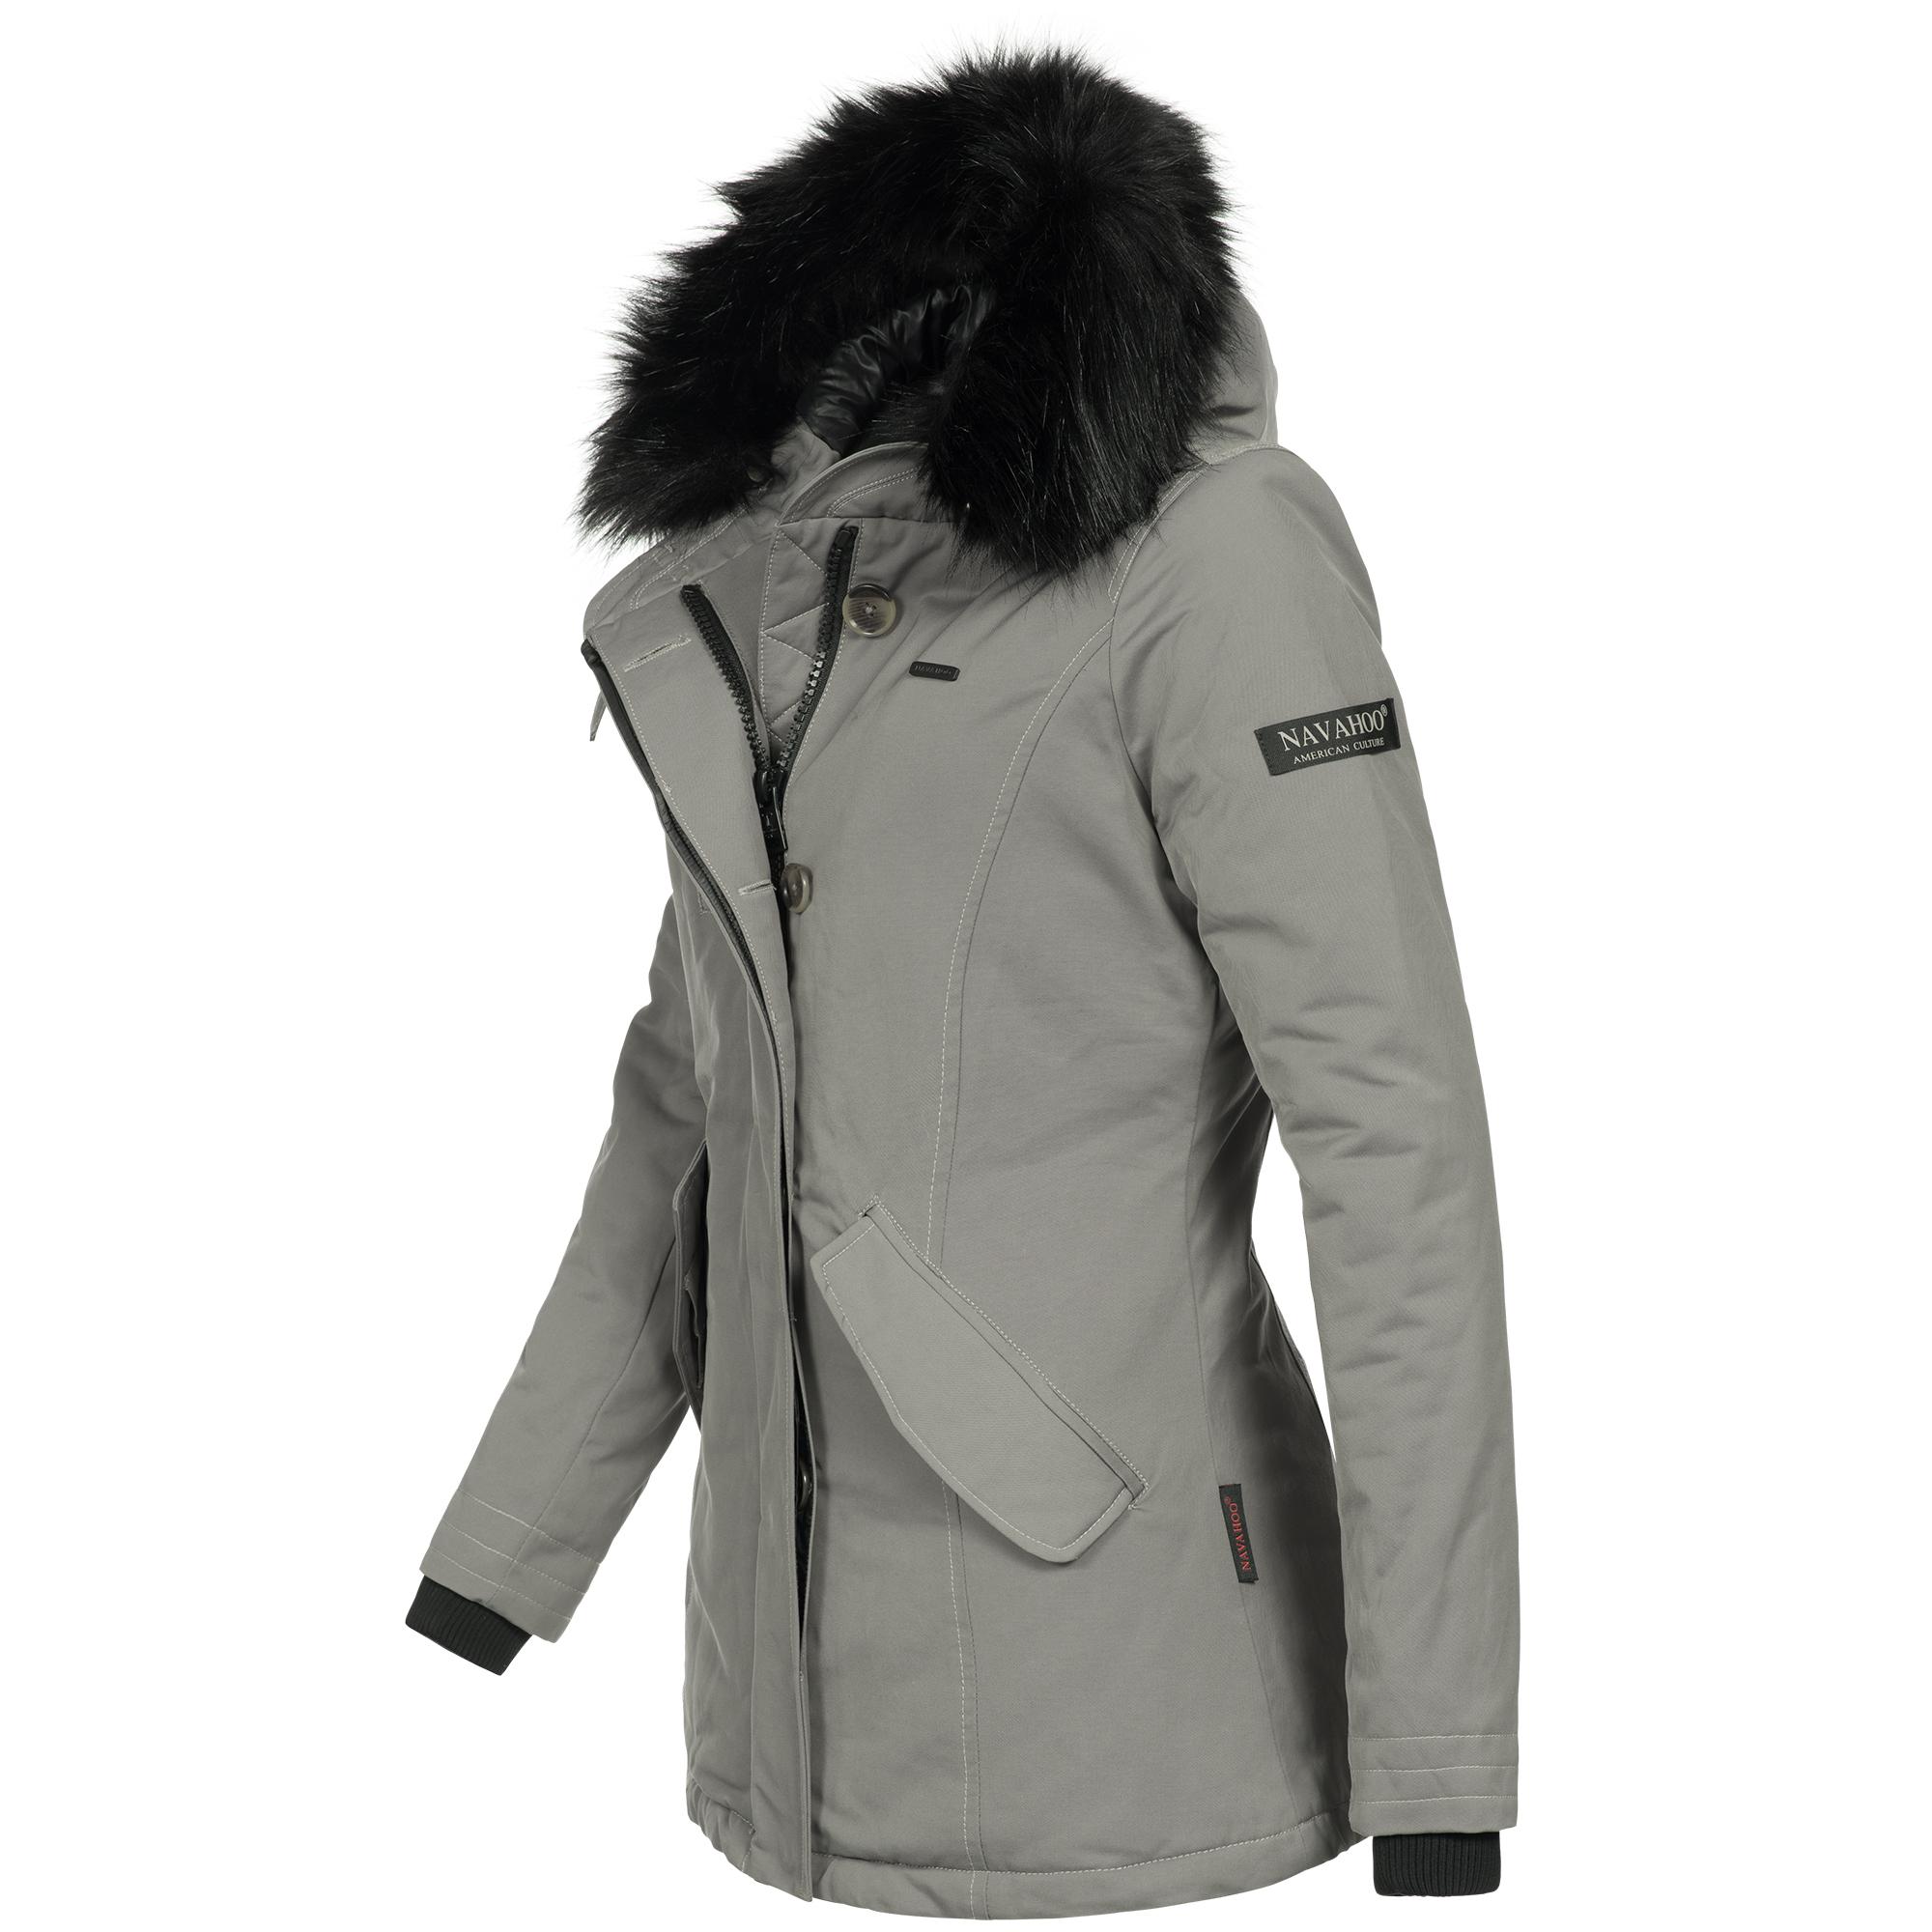 offizielle Bilder klassisch retro Navahoo NISAM Damen Jacke Parka Mantel Winterjacke warm gefüttert Kunstpelz  Luxus 9 Farben